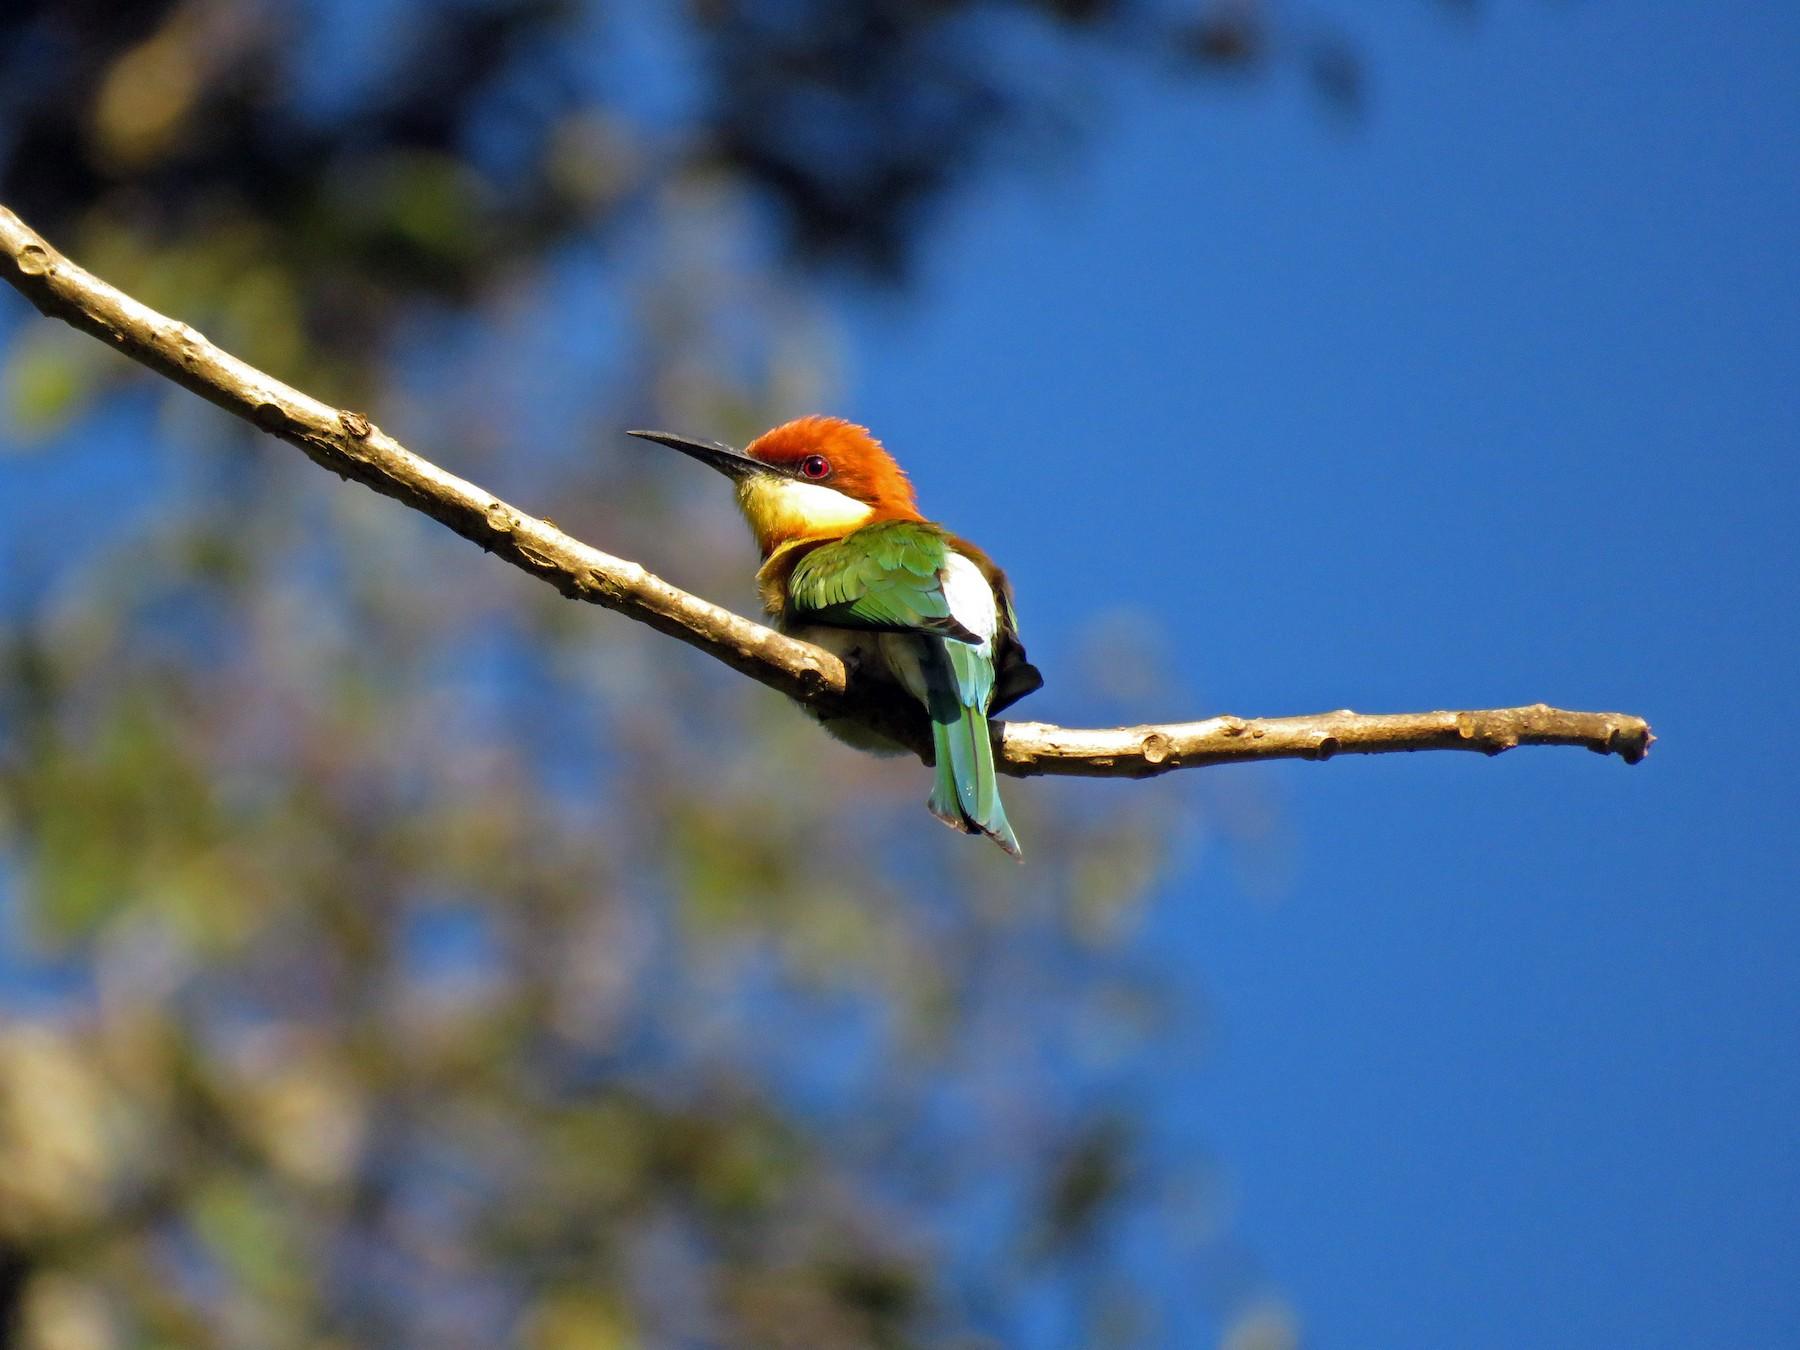 Chestnut-headed Bee-eater - Selvaganesh K